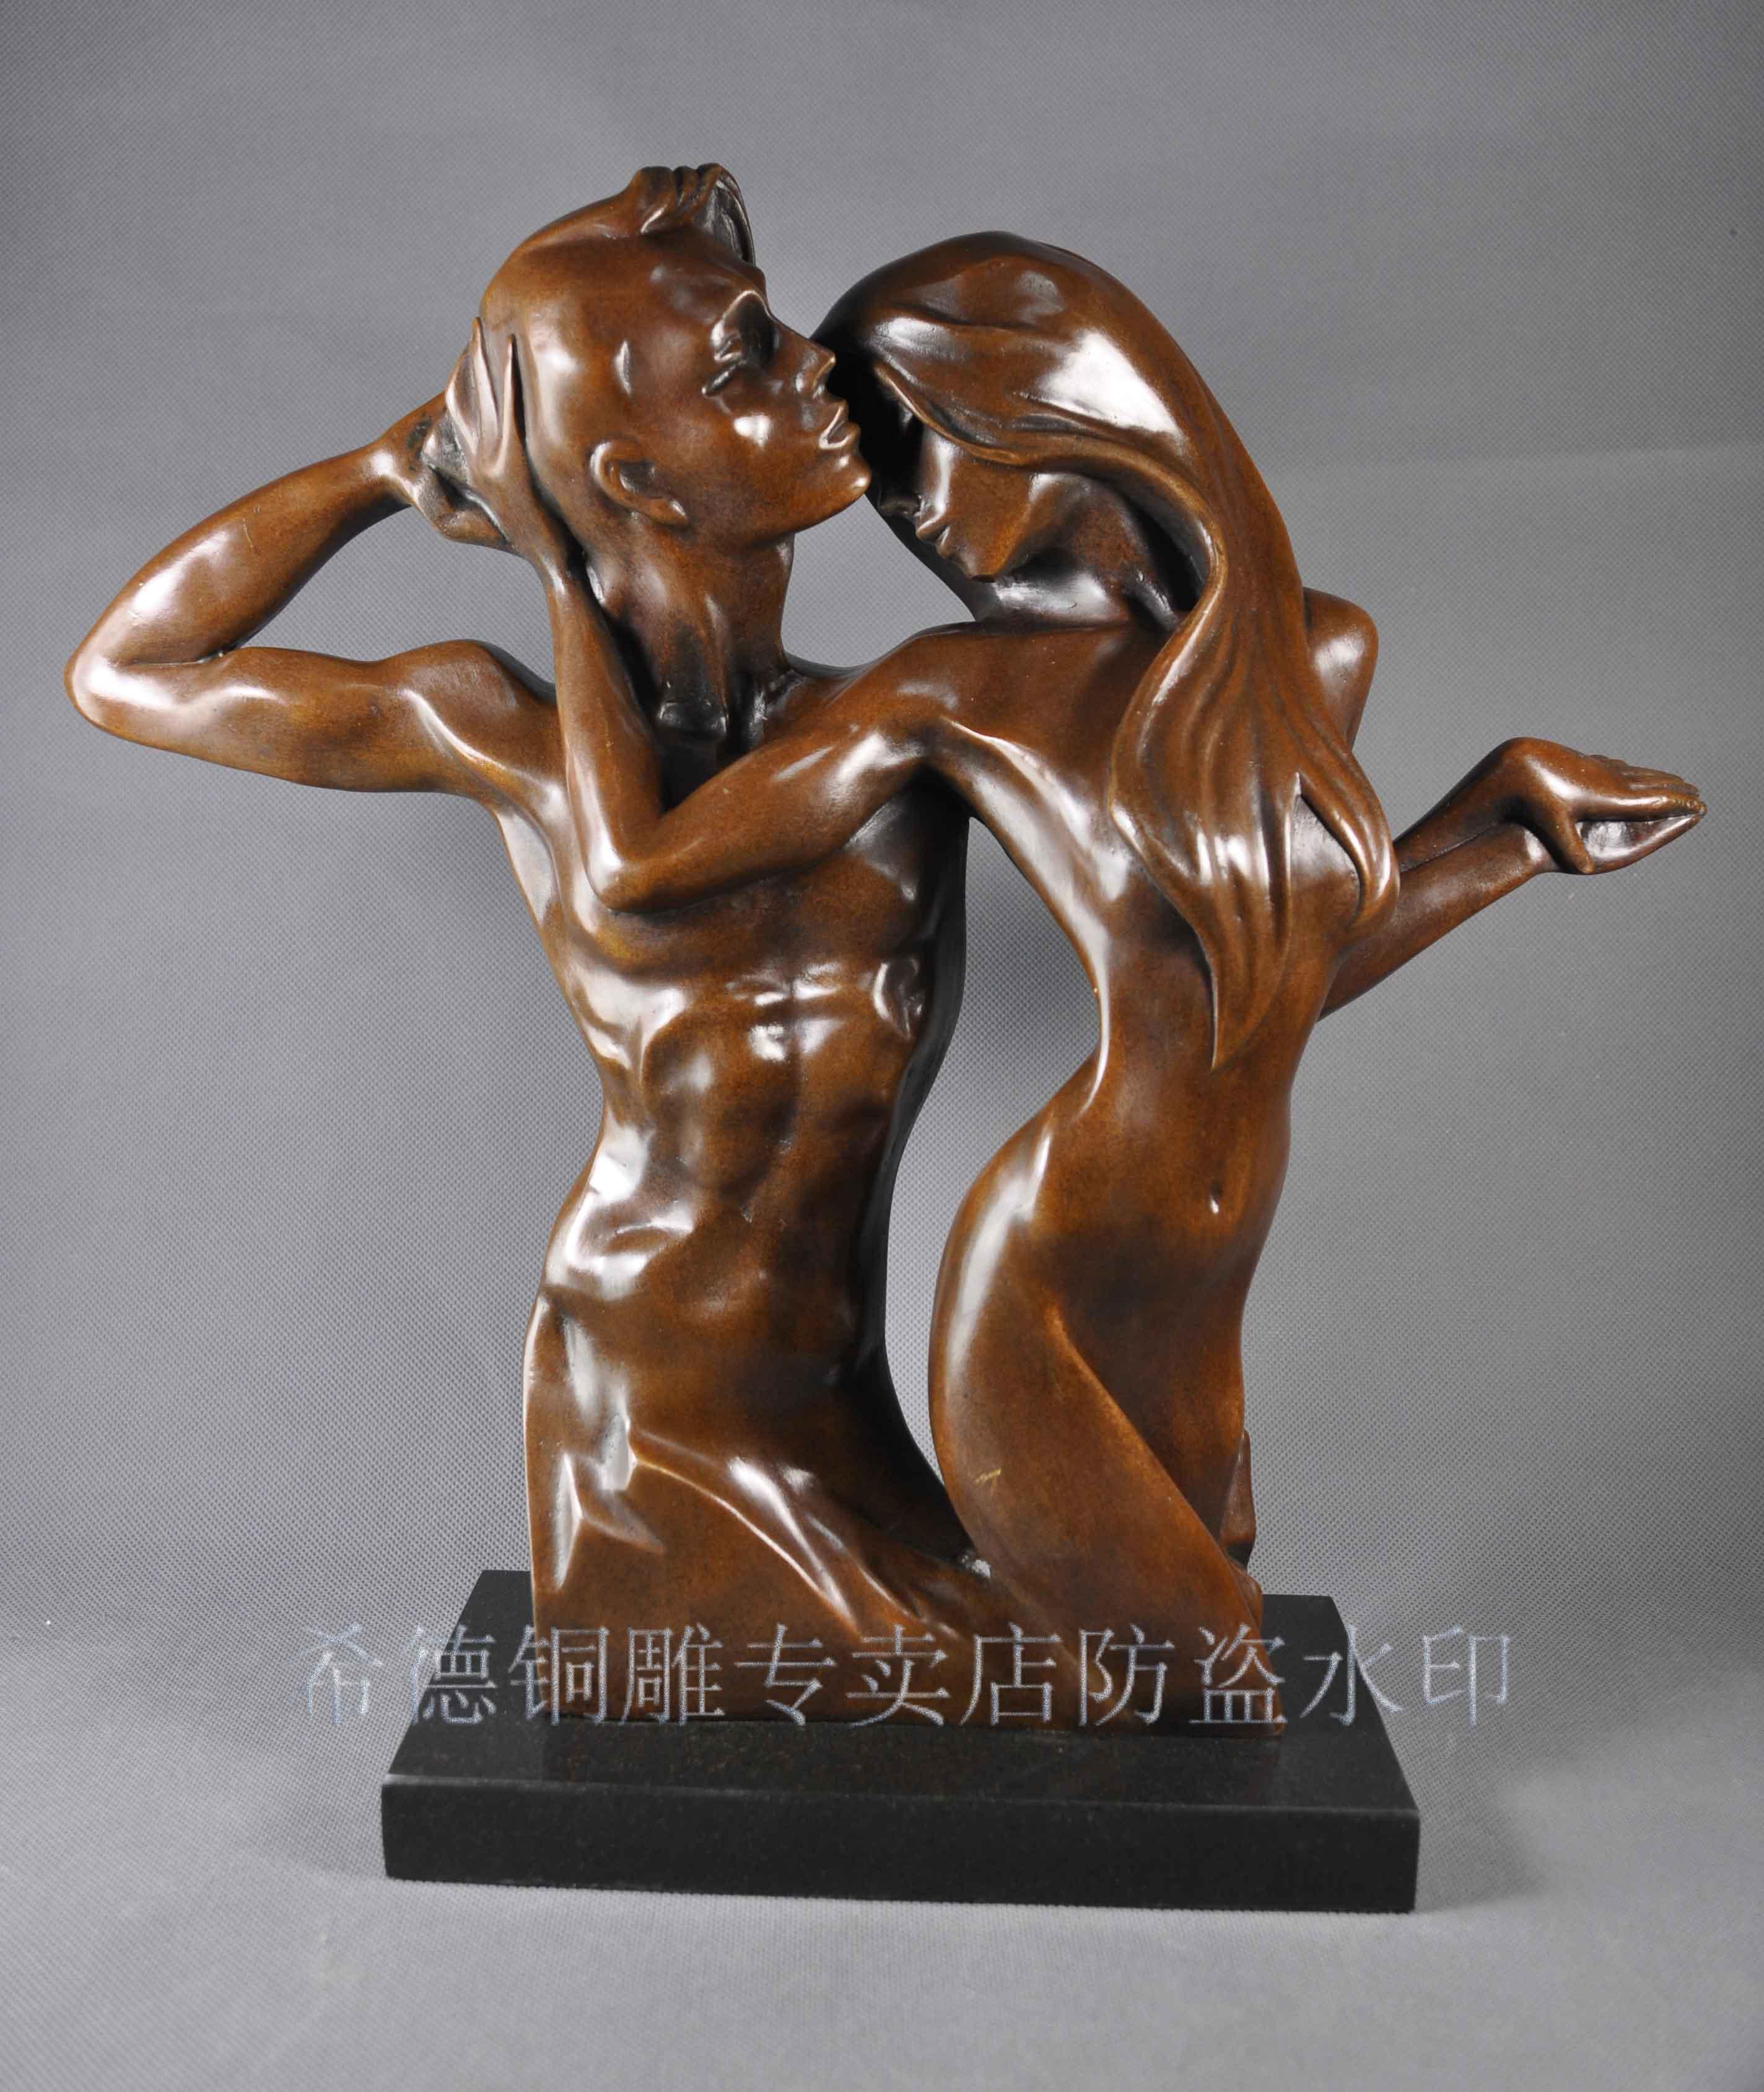 Bronze sculpture, copper sculpture crafts abstract sculpture modern brief decoration wedding gifts ds-386Bronze sculpture, copper sculpture crafts abstract sculpture modern brief decoration wedding gifts ds-386